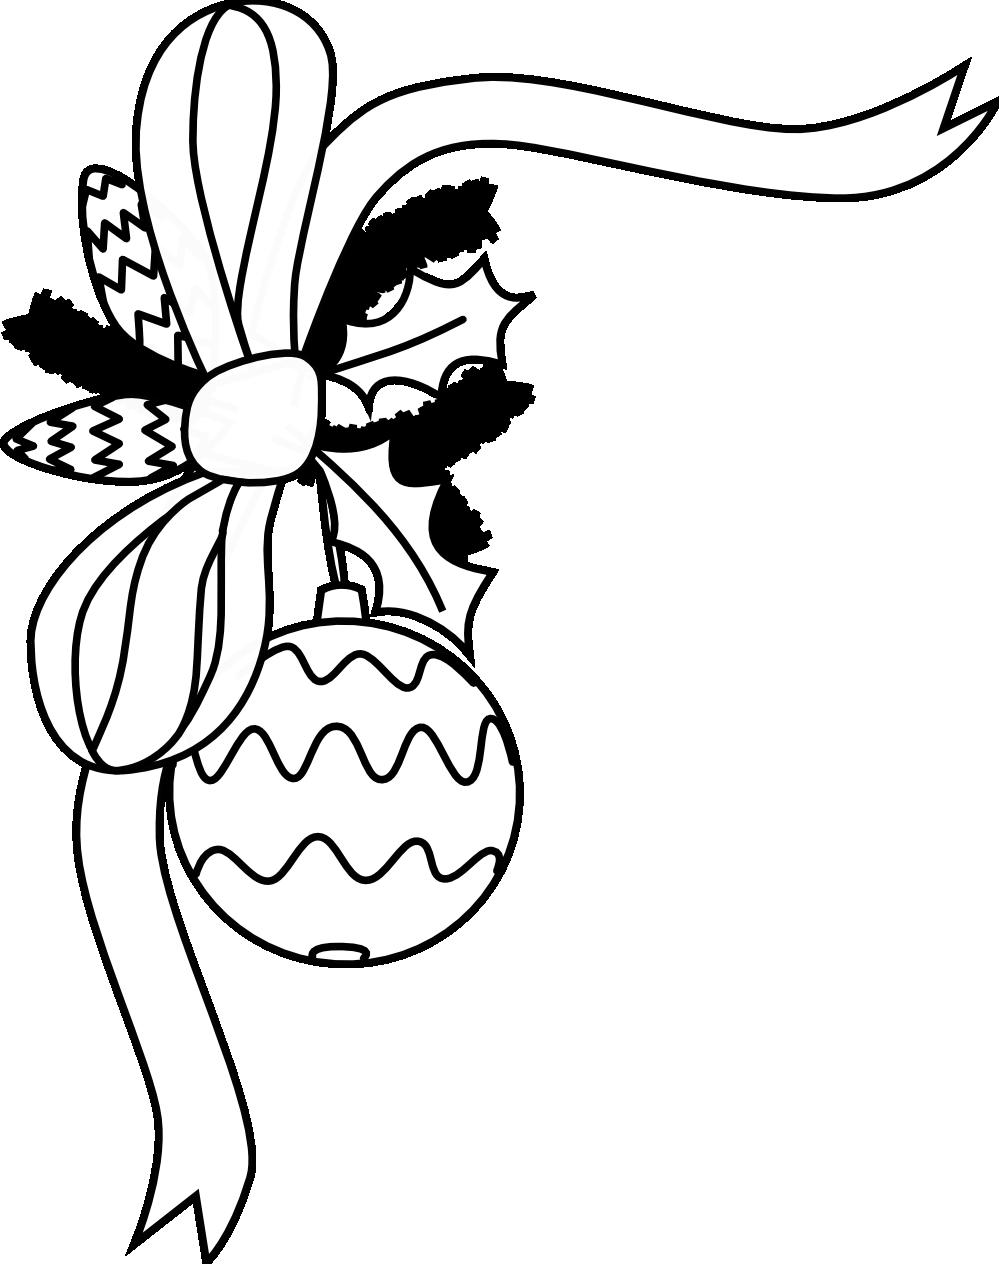 999x1264 Drawn Christmas Ornaments Christmas Border Black And White